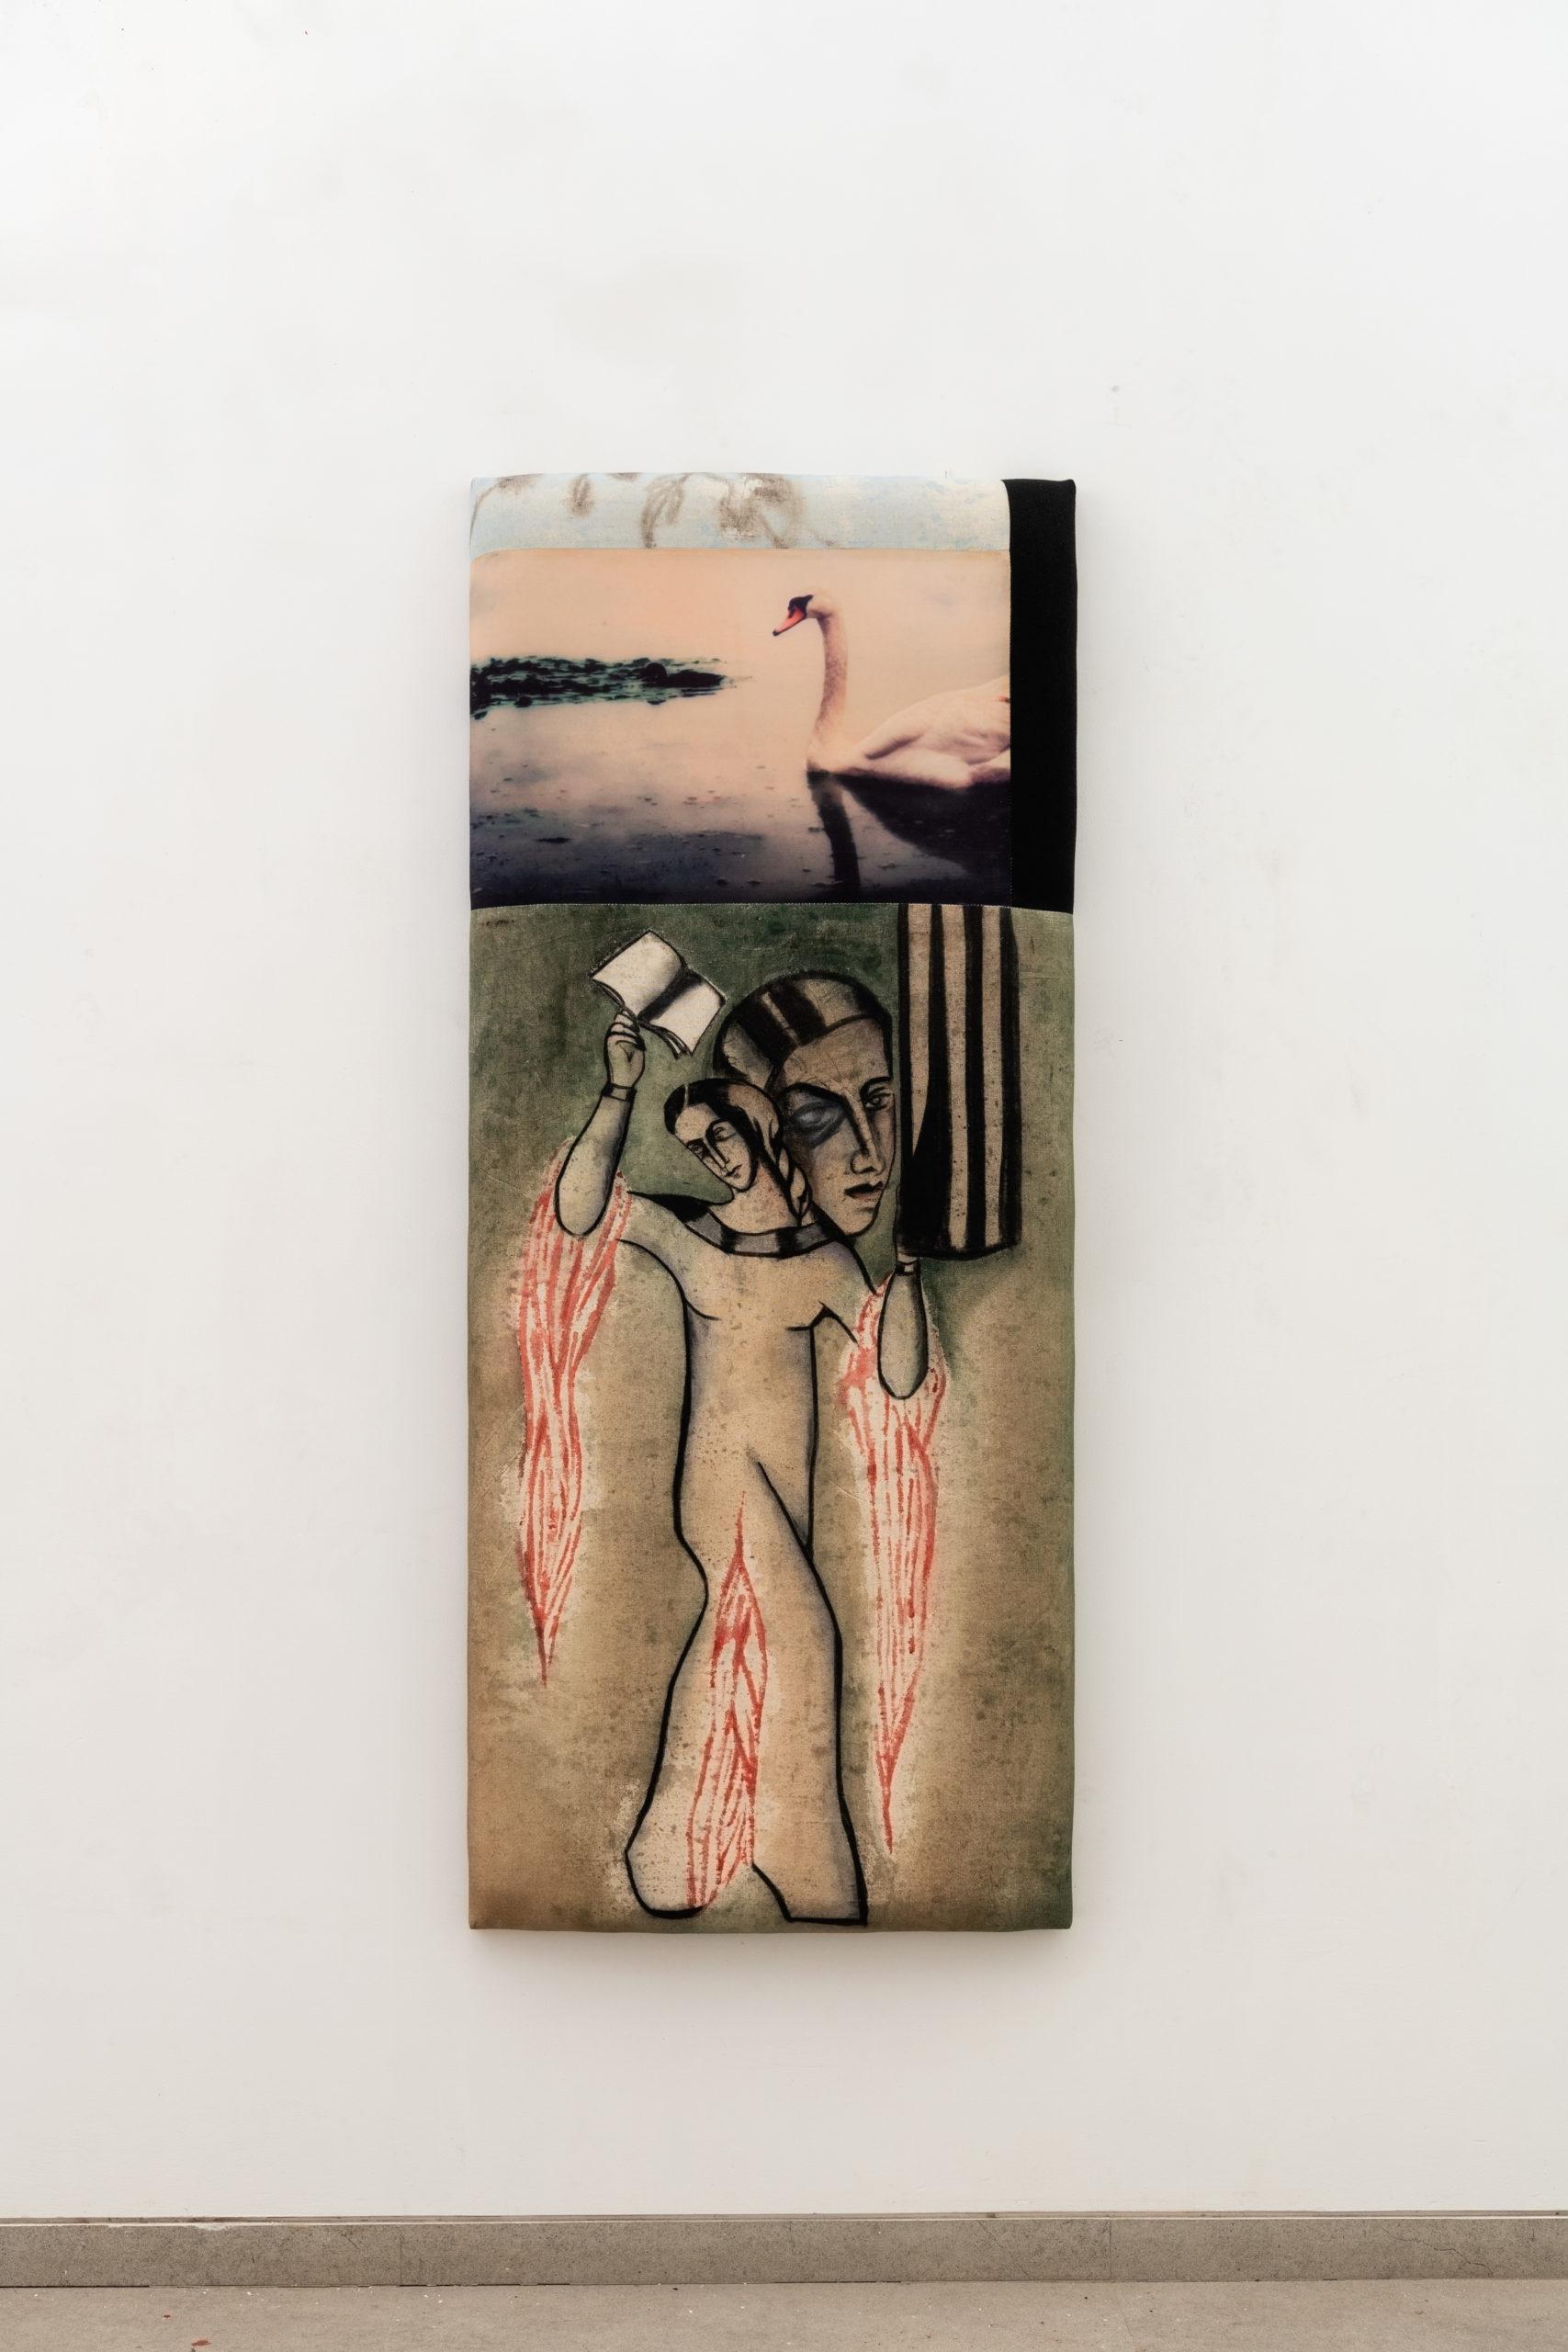 Anju Dodiya Swan on fire2021  Sculpture Fusain et aquarelle sur tissu tendu sur planche rembourrée / Charcoal and watercolour on fabric combine stretched on padded board.  122 x 51 x 6 cm – 48 x 20 1/8 x 2 3/8 in, courtesy galerie Templon Paris-Bruxelles